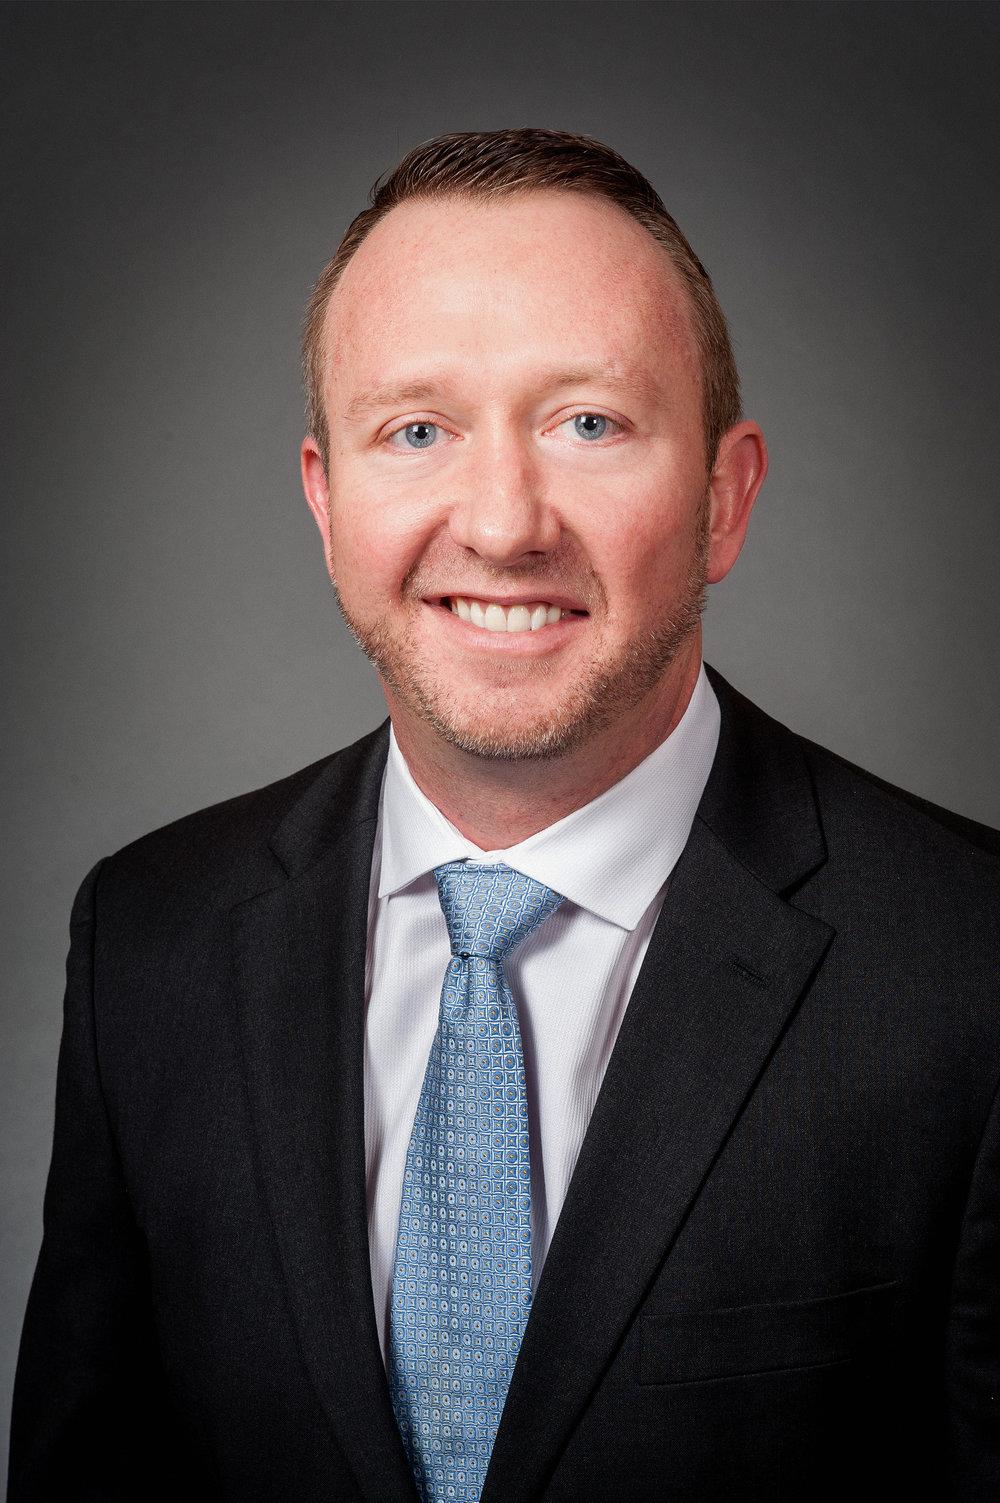 Chris McDirmit, CPA - Audit Partner